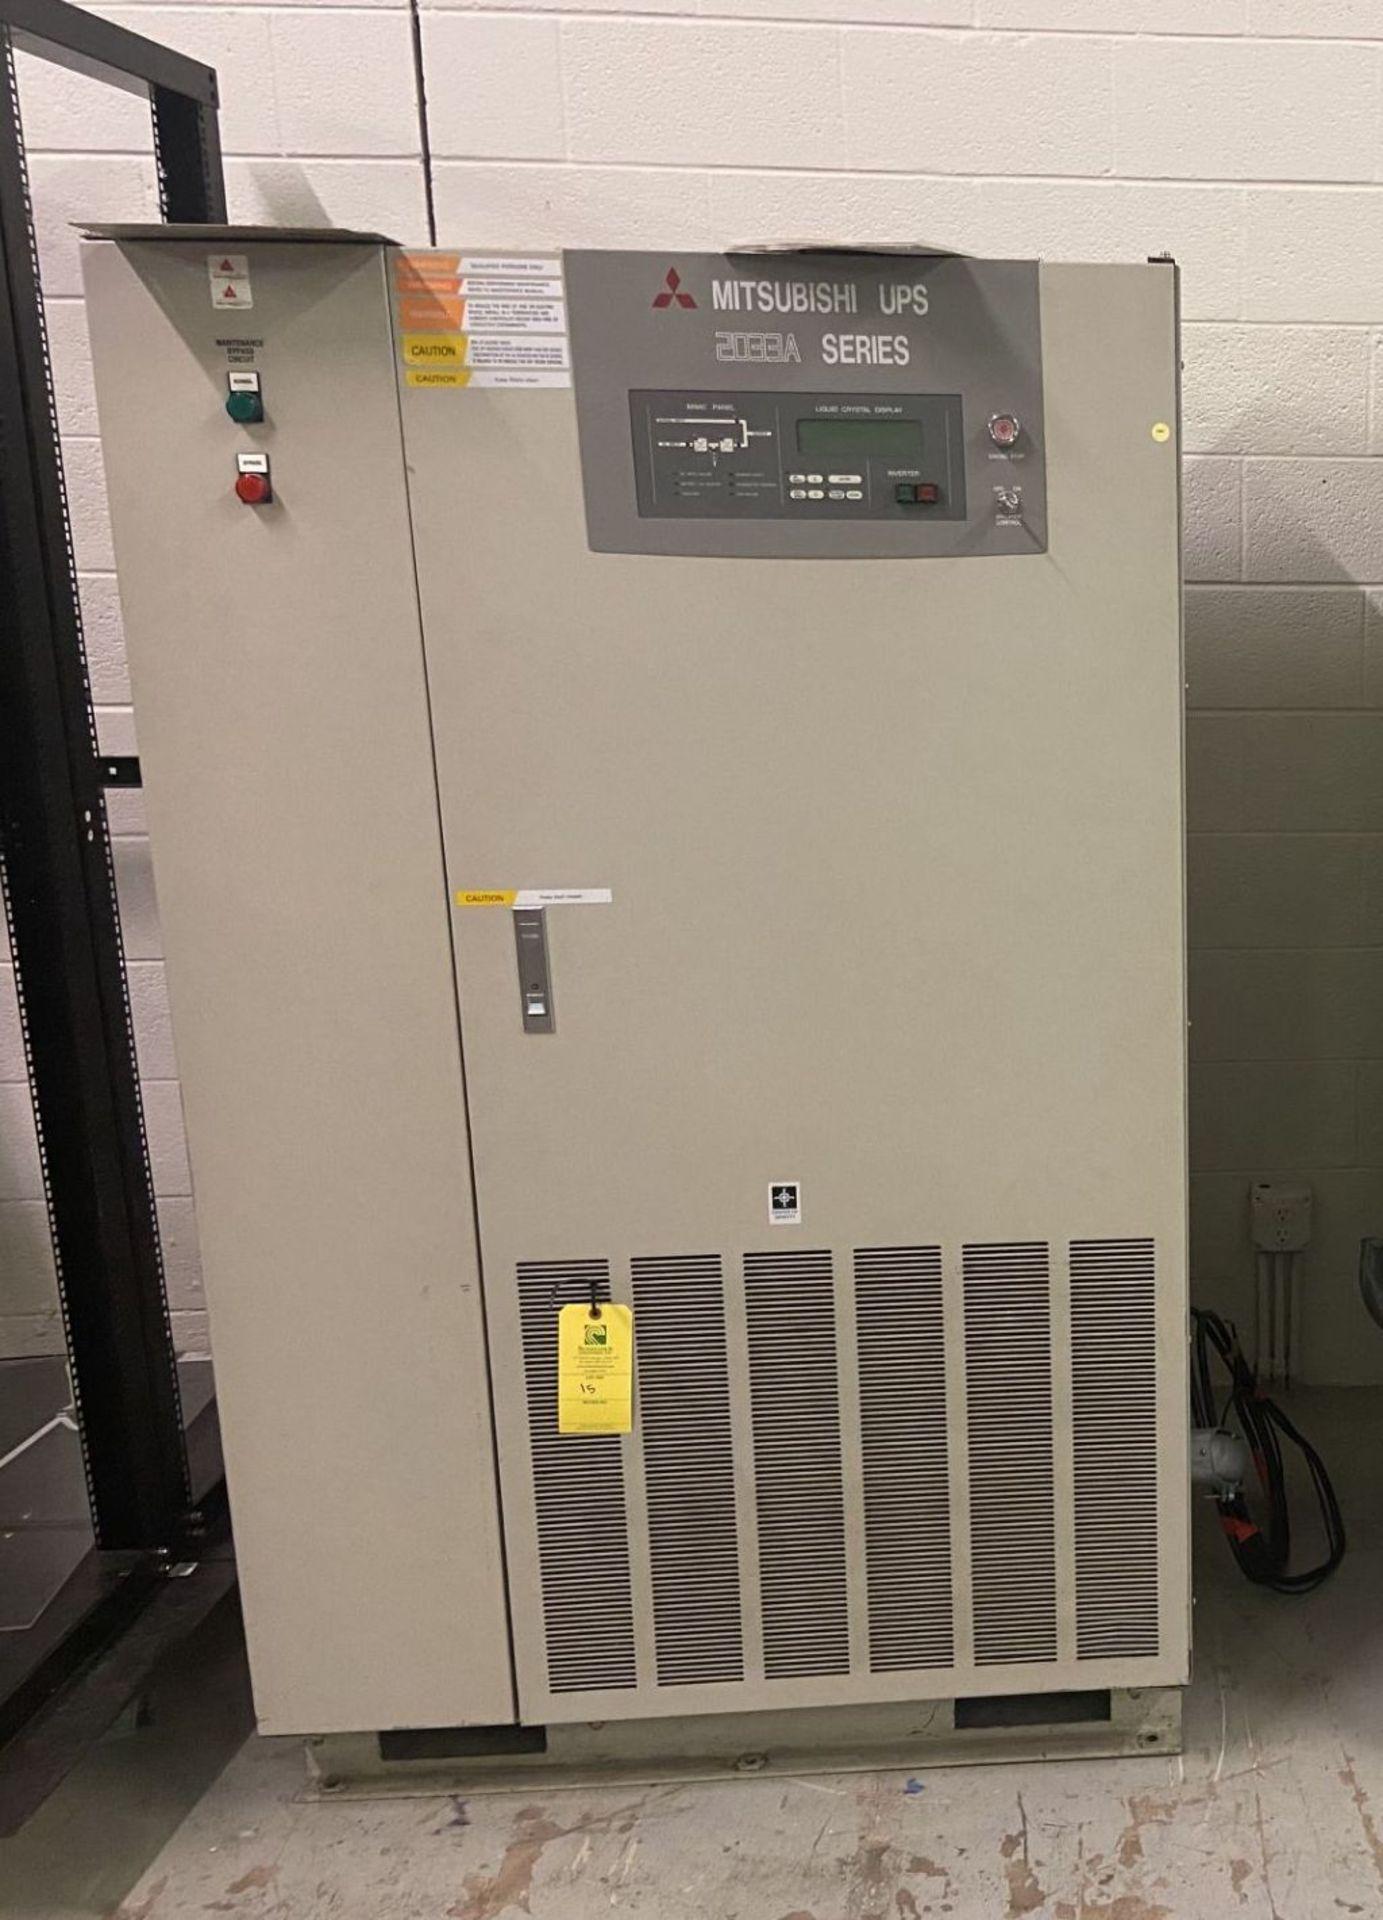 Mitsubishi Uninterruptible Power Supply, 2033A Series, Type UP2033A-B403SU-2, Serial# 96-GC8YQI-04,